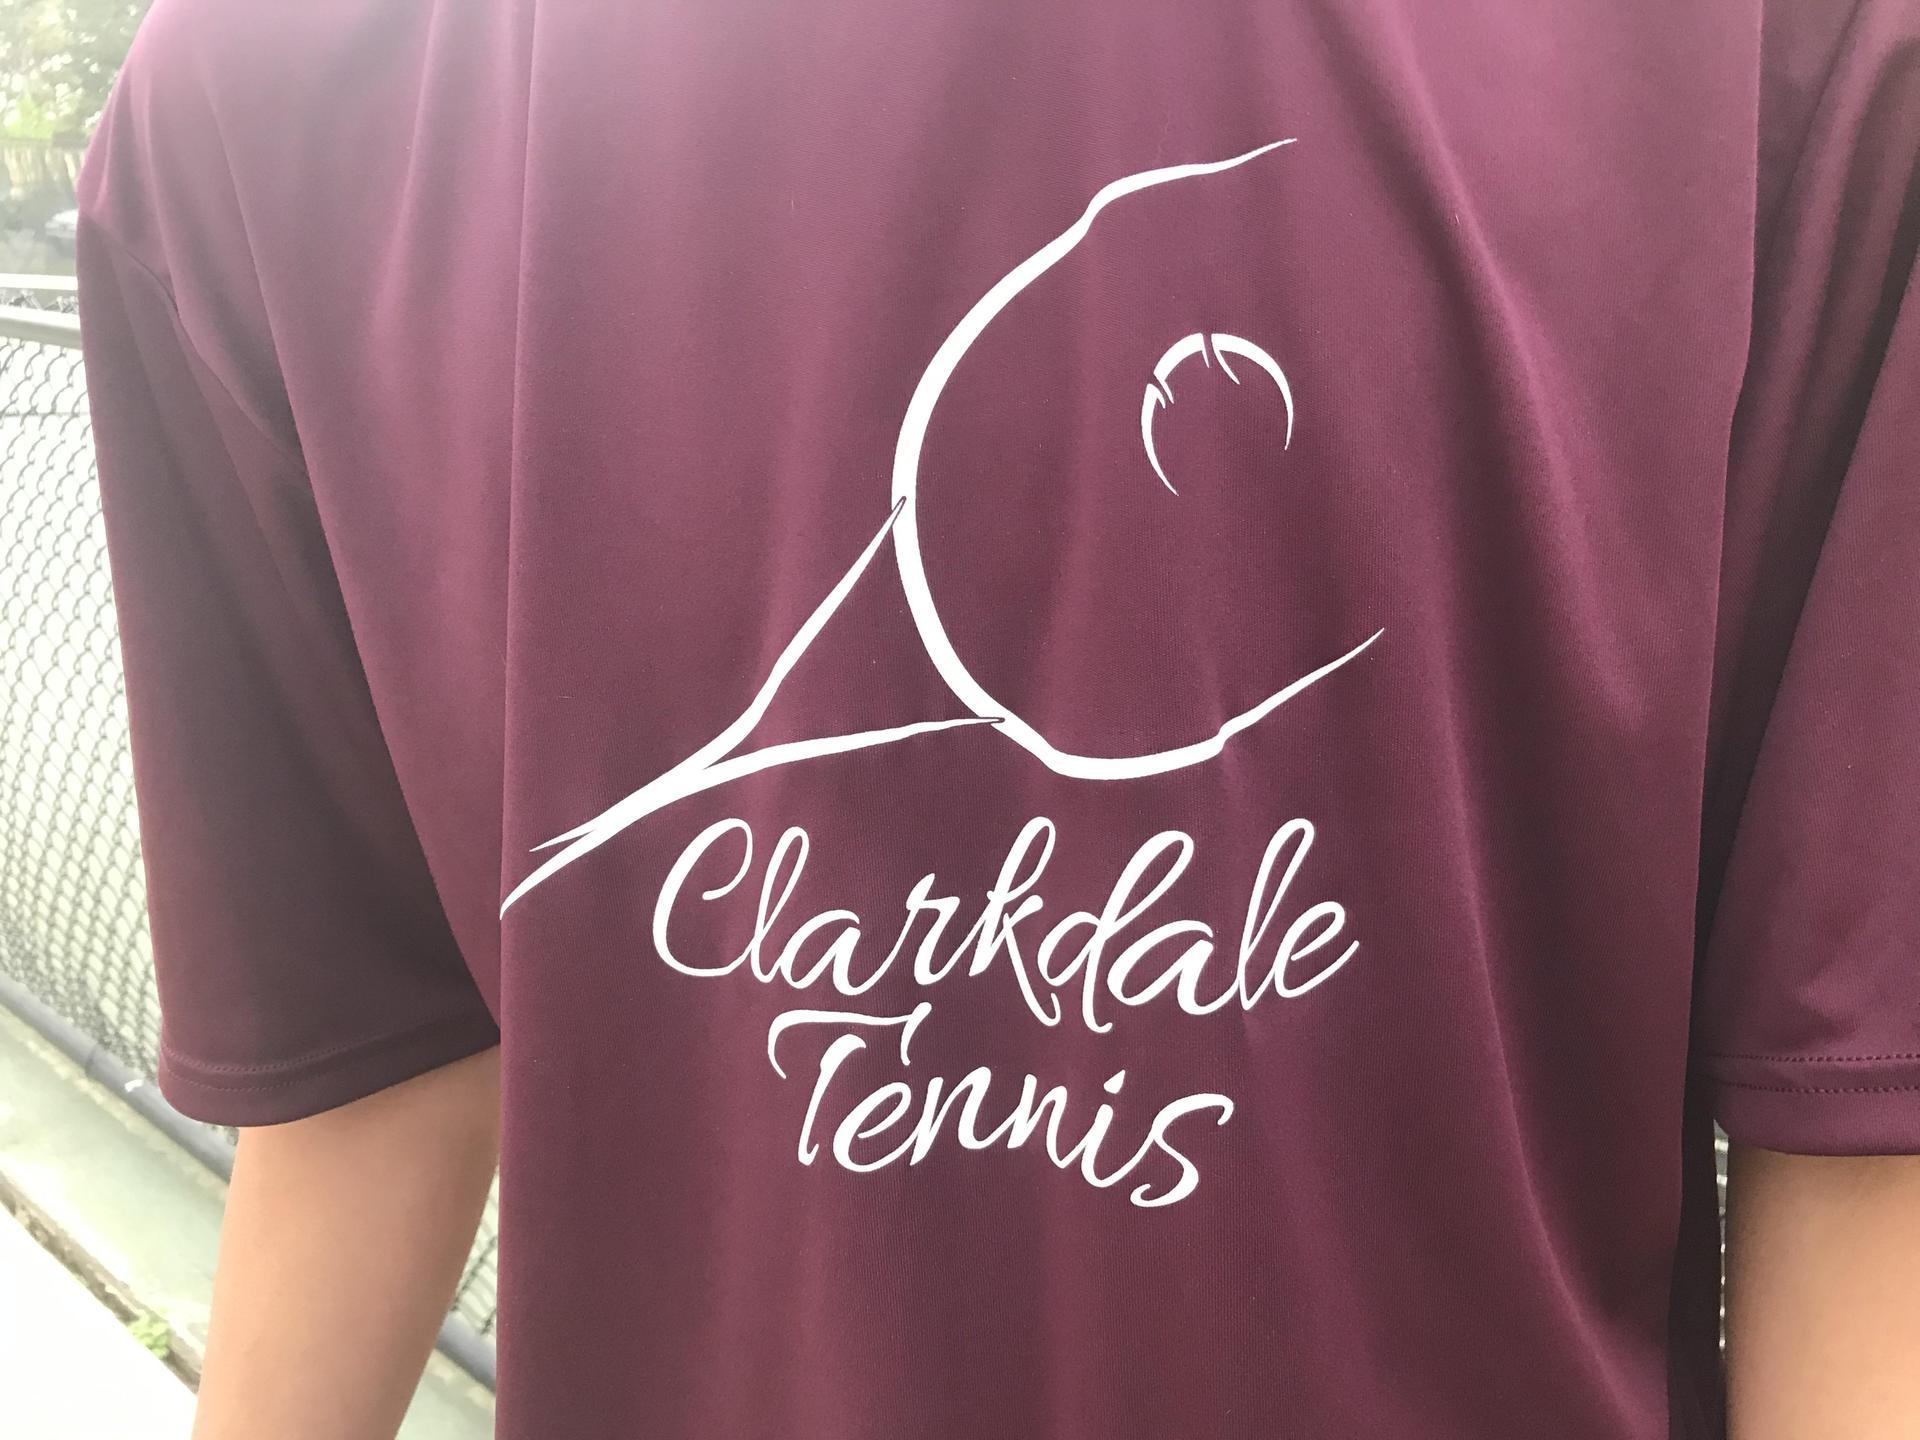 CHS Tennis Shirt